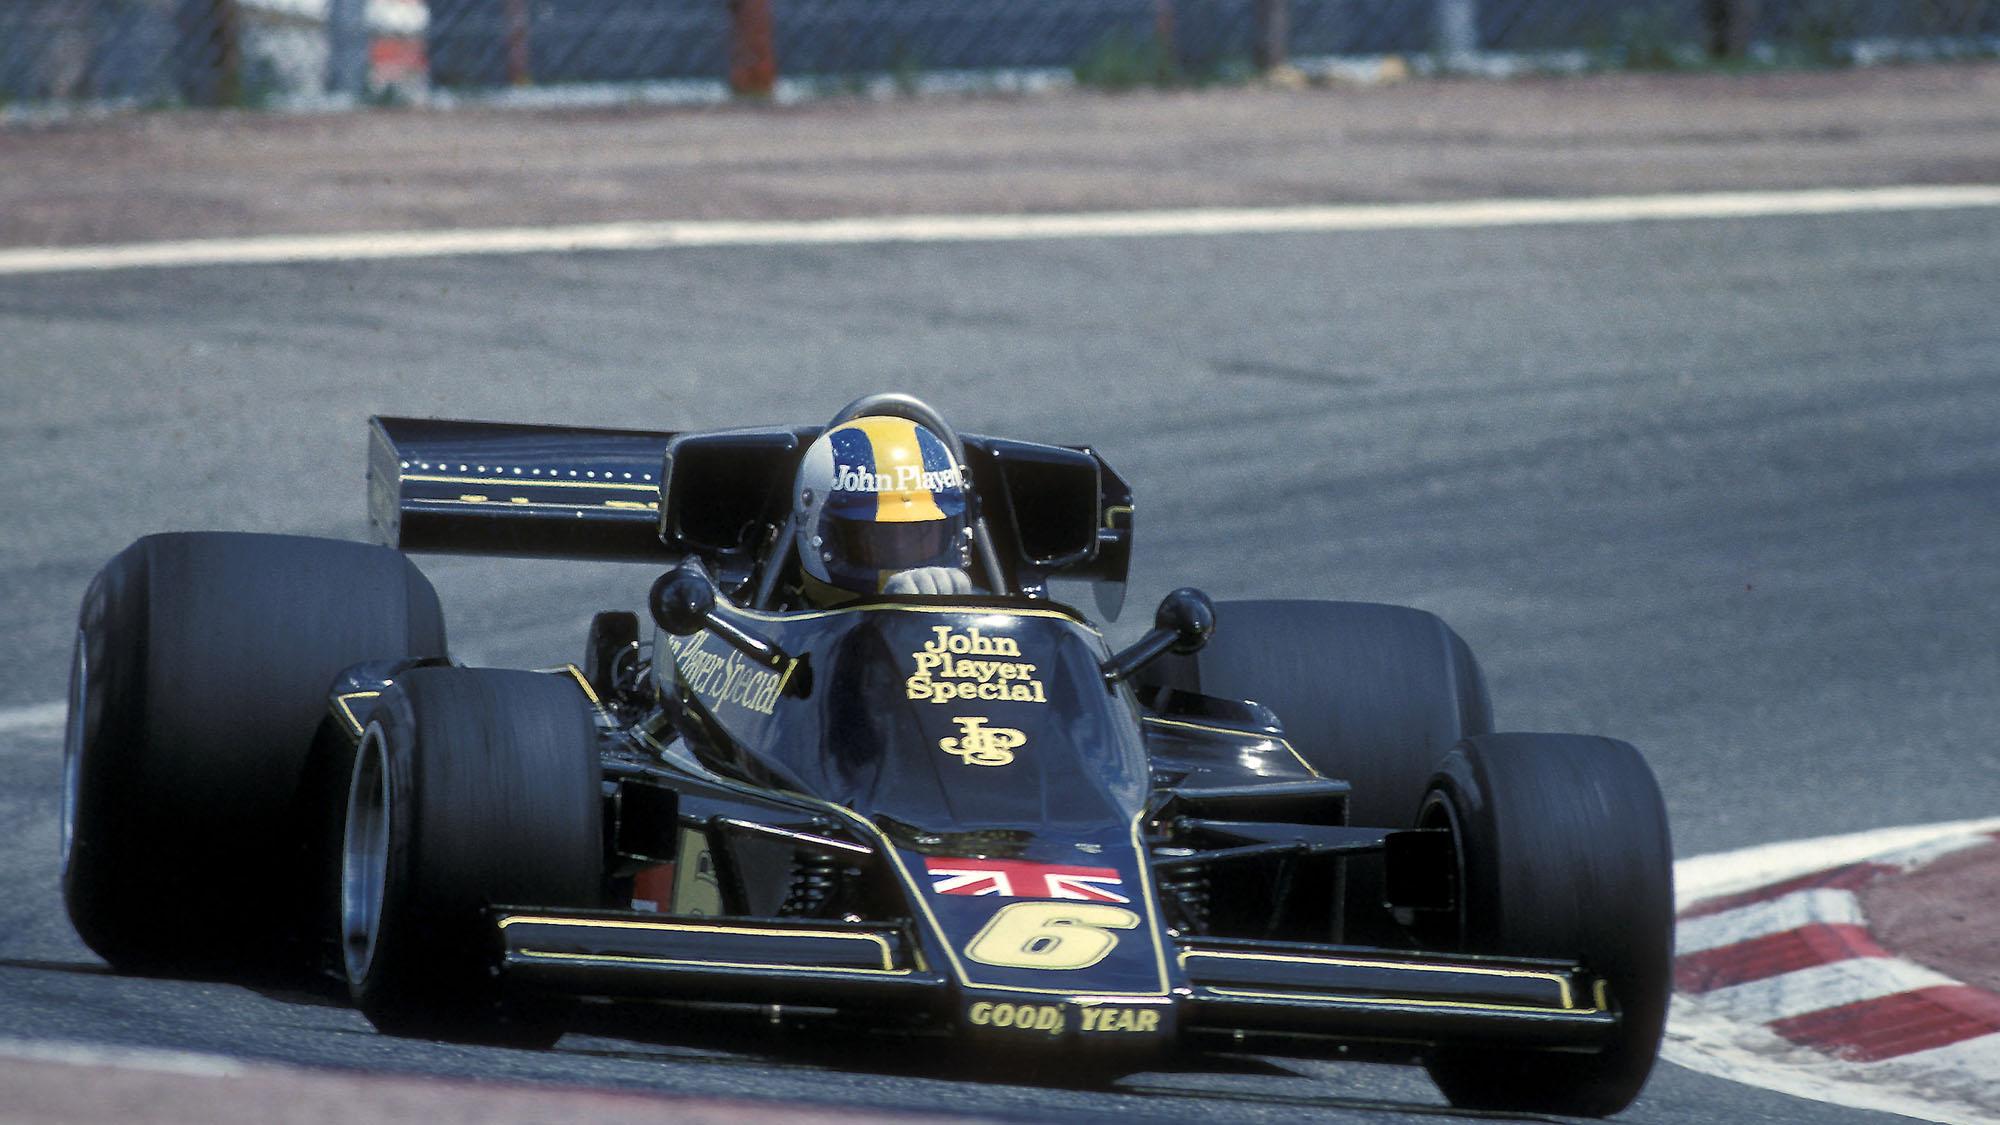 AUTO - F1 1976 - SPAIN - JARAMA 19760502 - PHOTO: DPPI GUNNAR NILSSON (SWE) / LOTUS FORD - ACTION